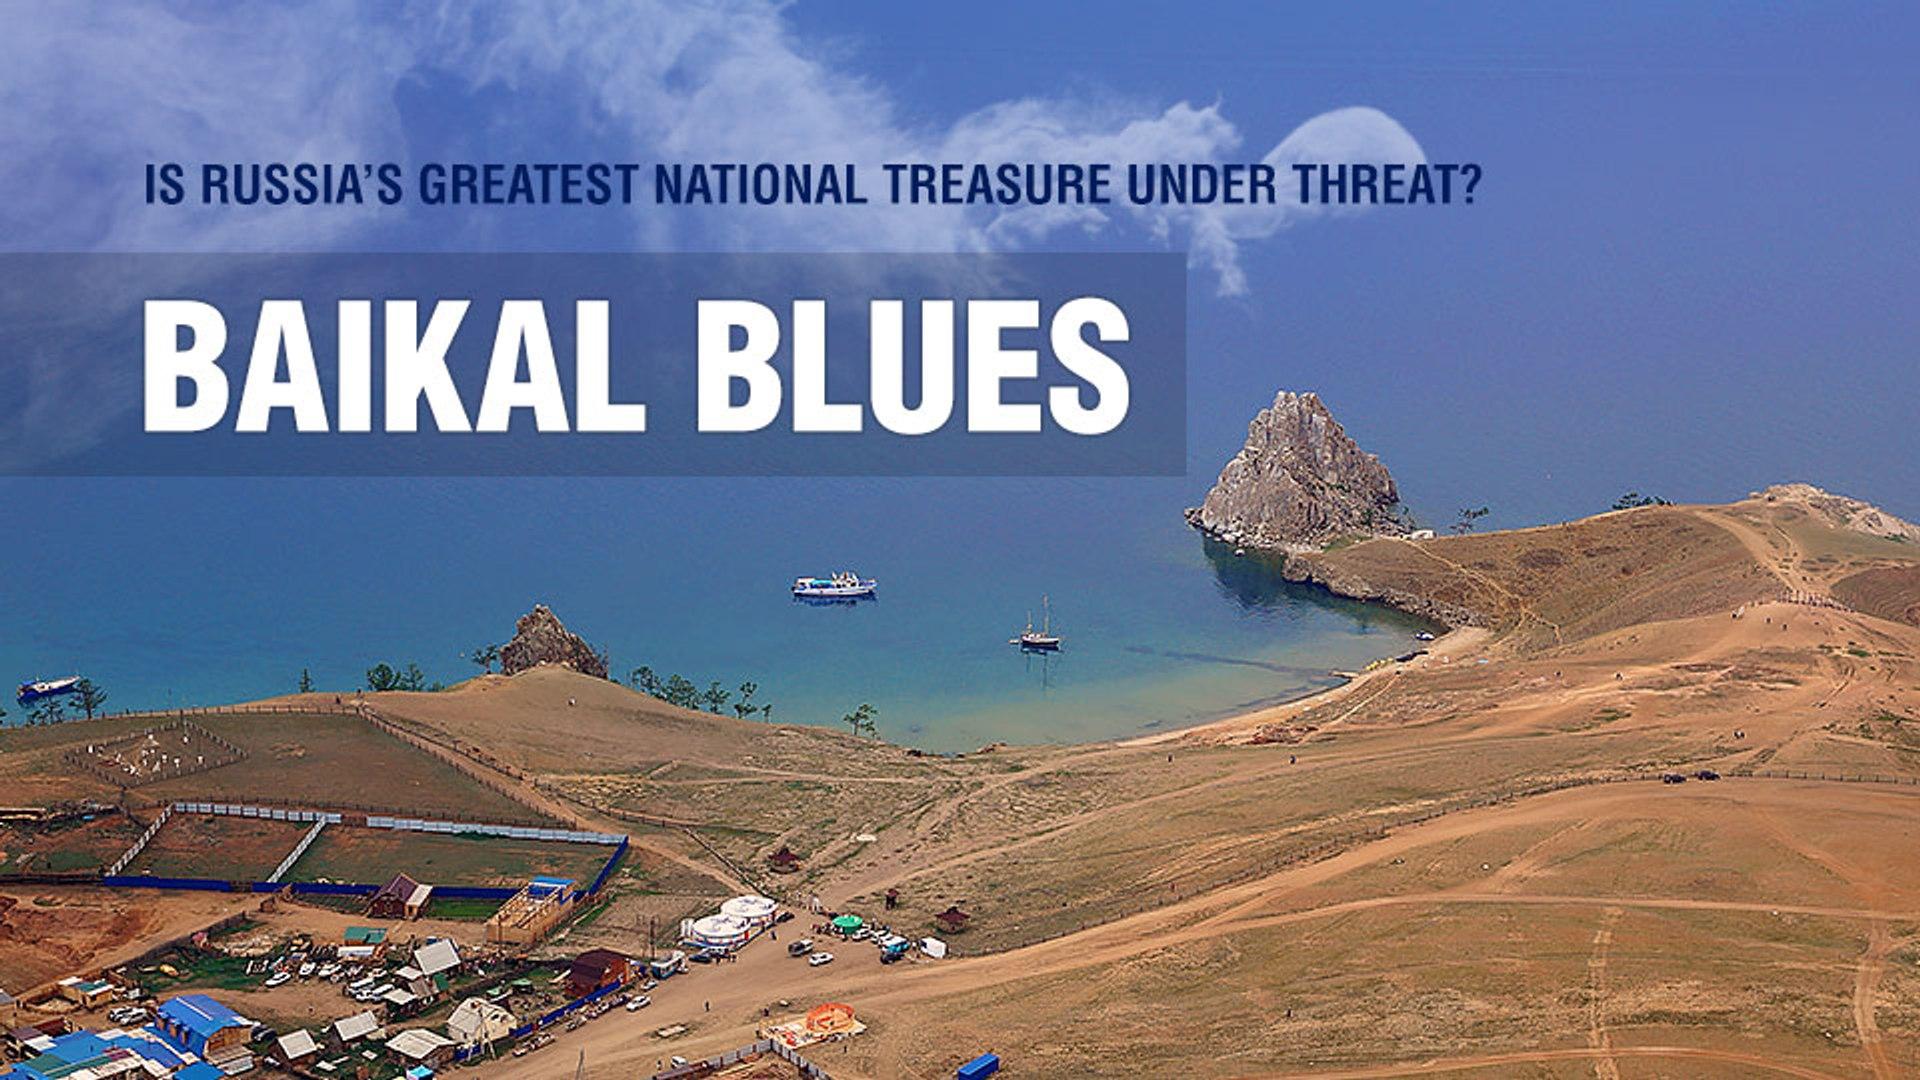 Baikal Blues.  Is Russia's greatest national treasure under threat?